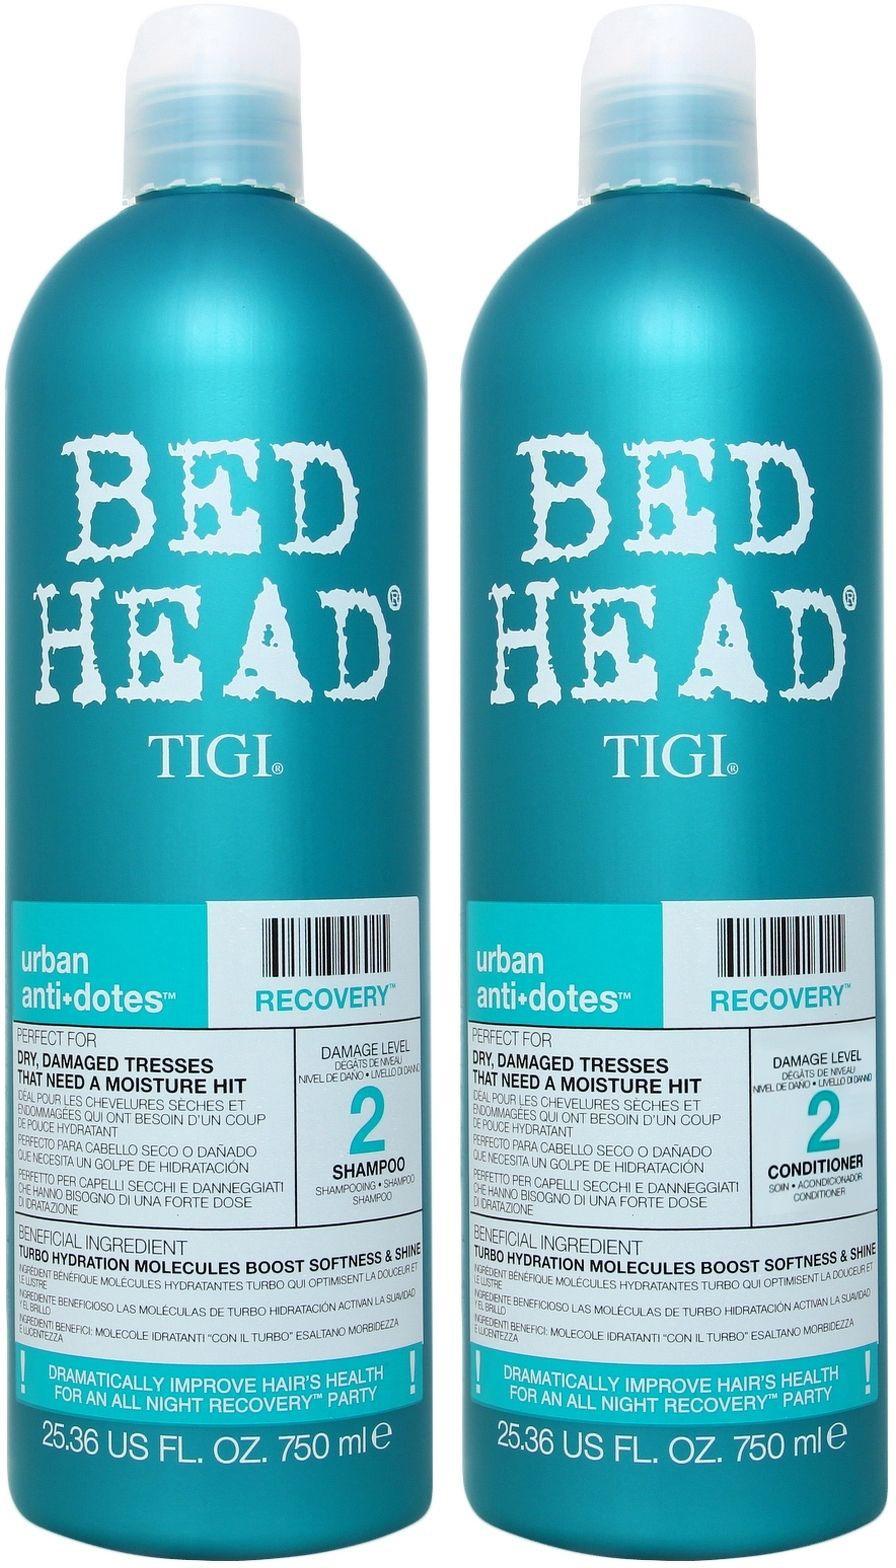 Tigi Bed Head Recovery šampoon + palsam 2x750ml